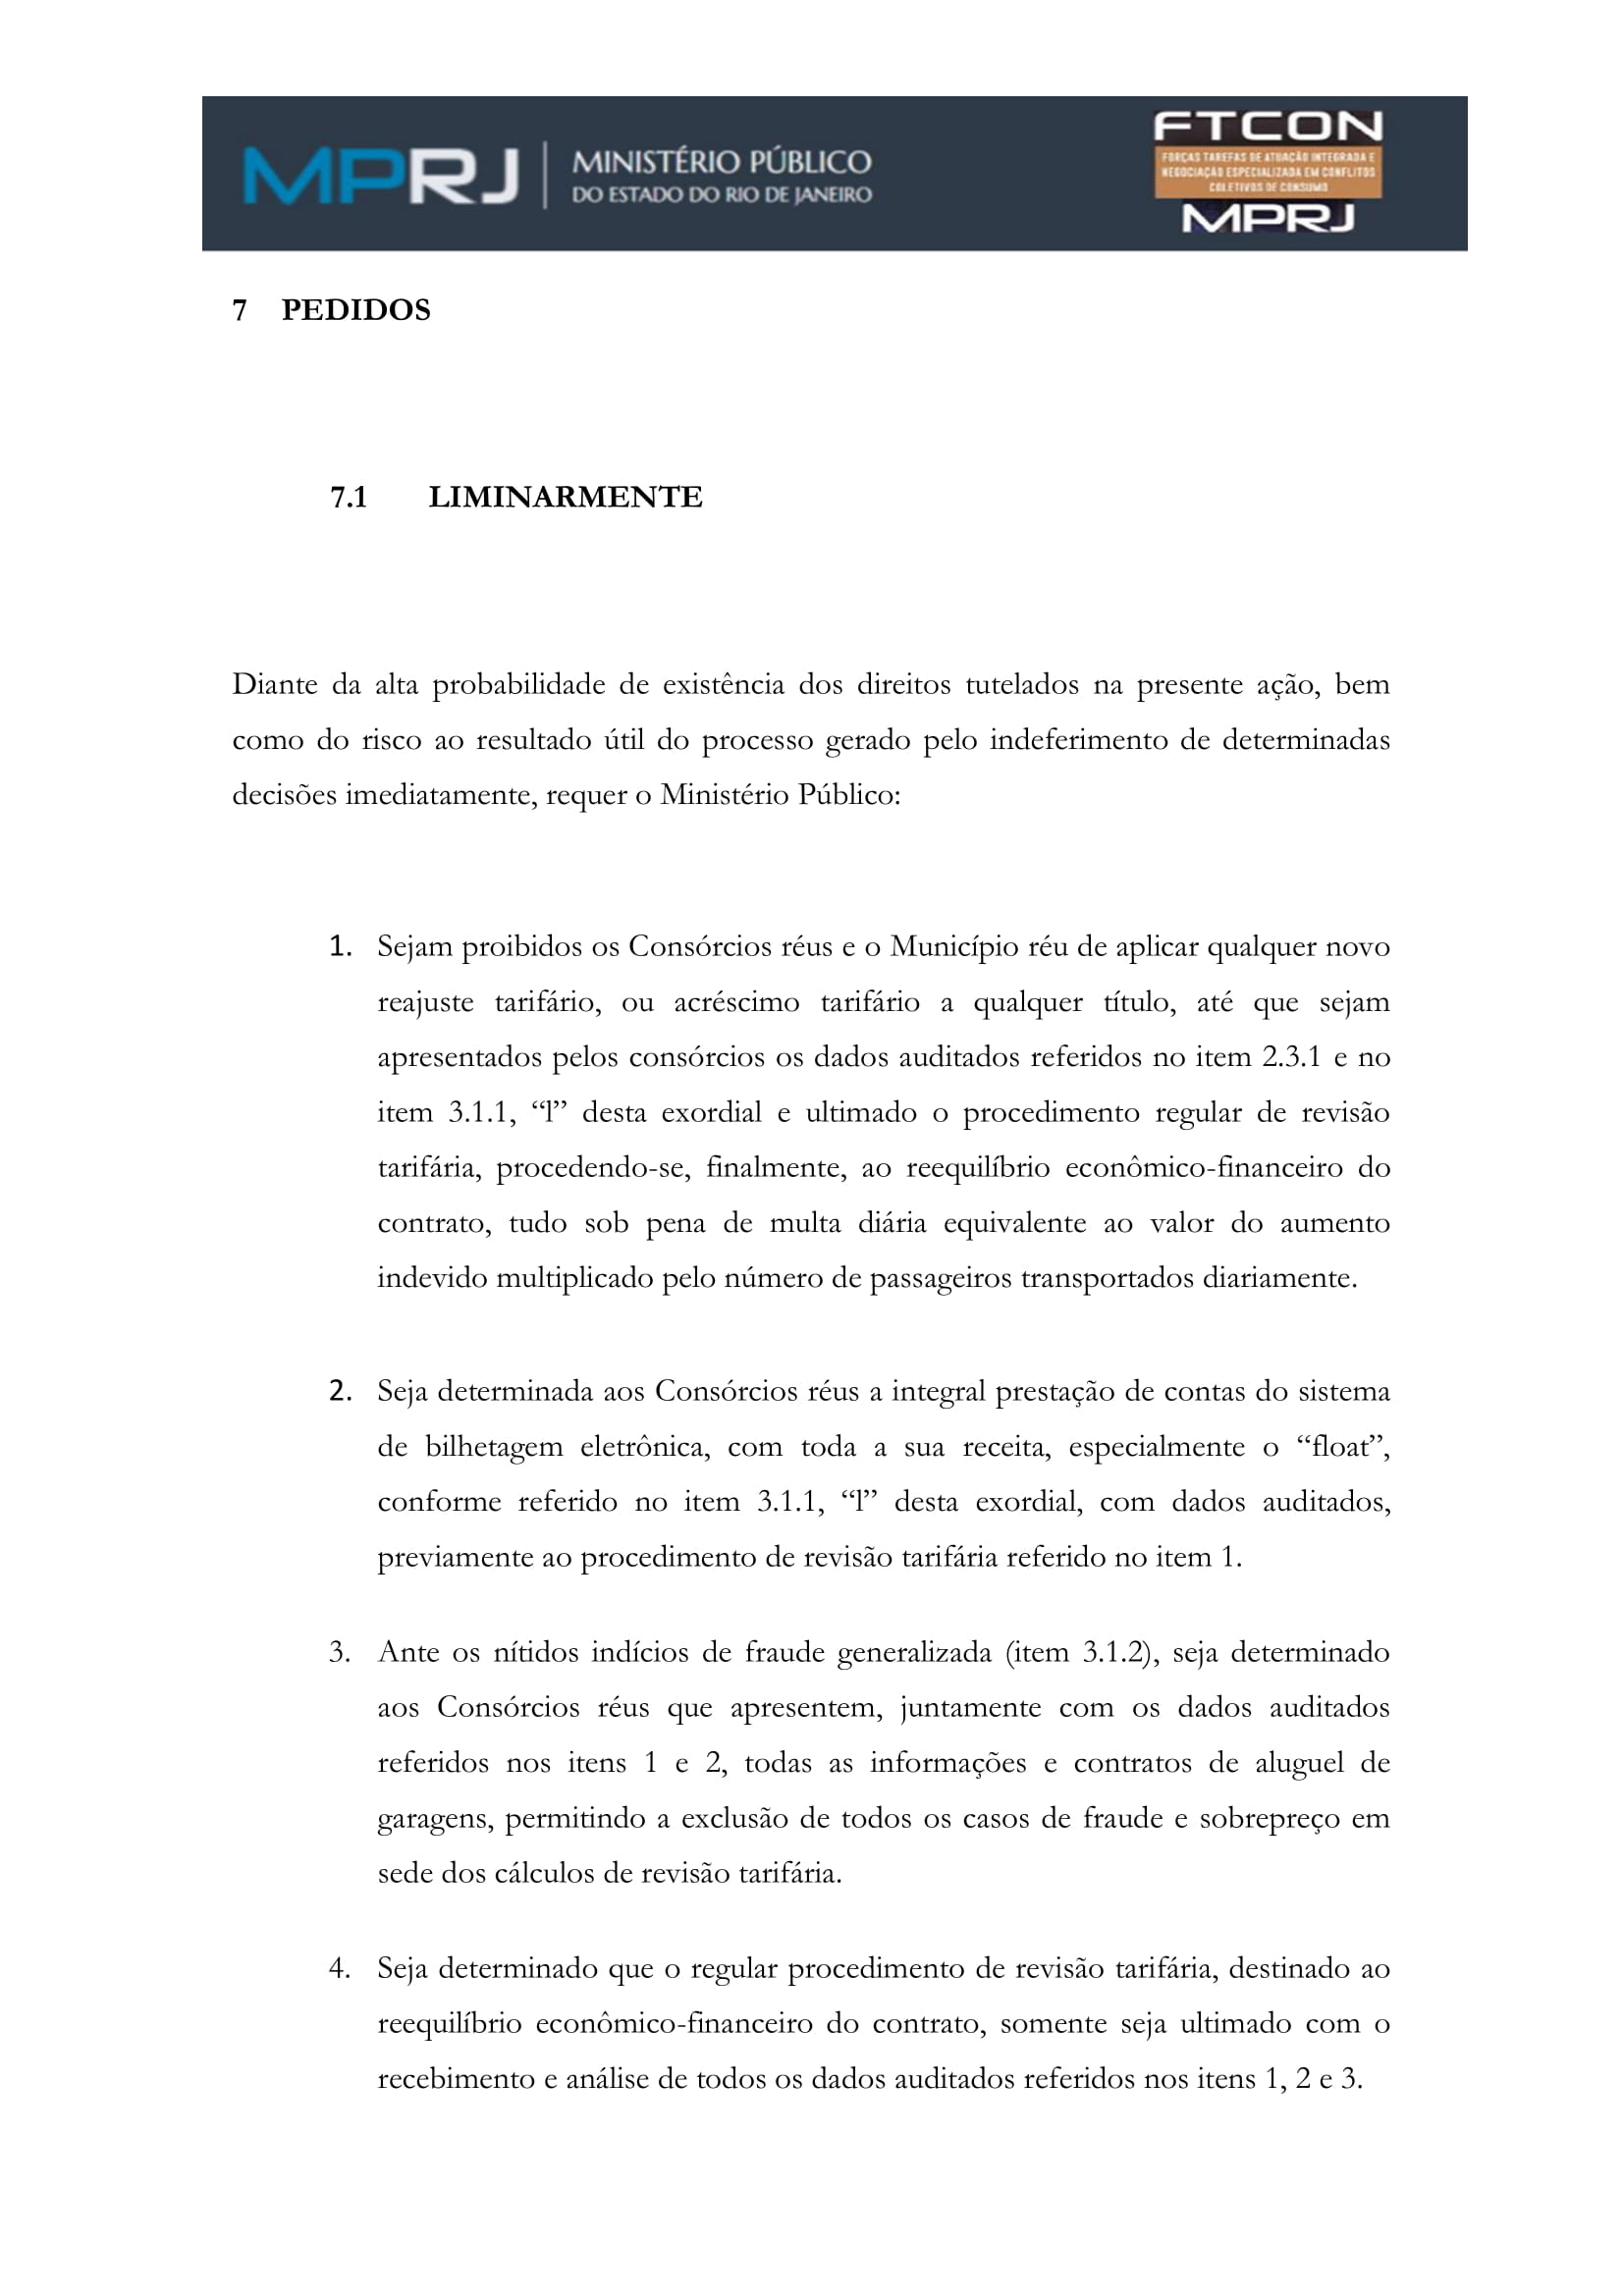 acp_caducidade_onibus_dr_rt-134